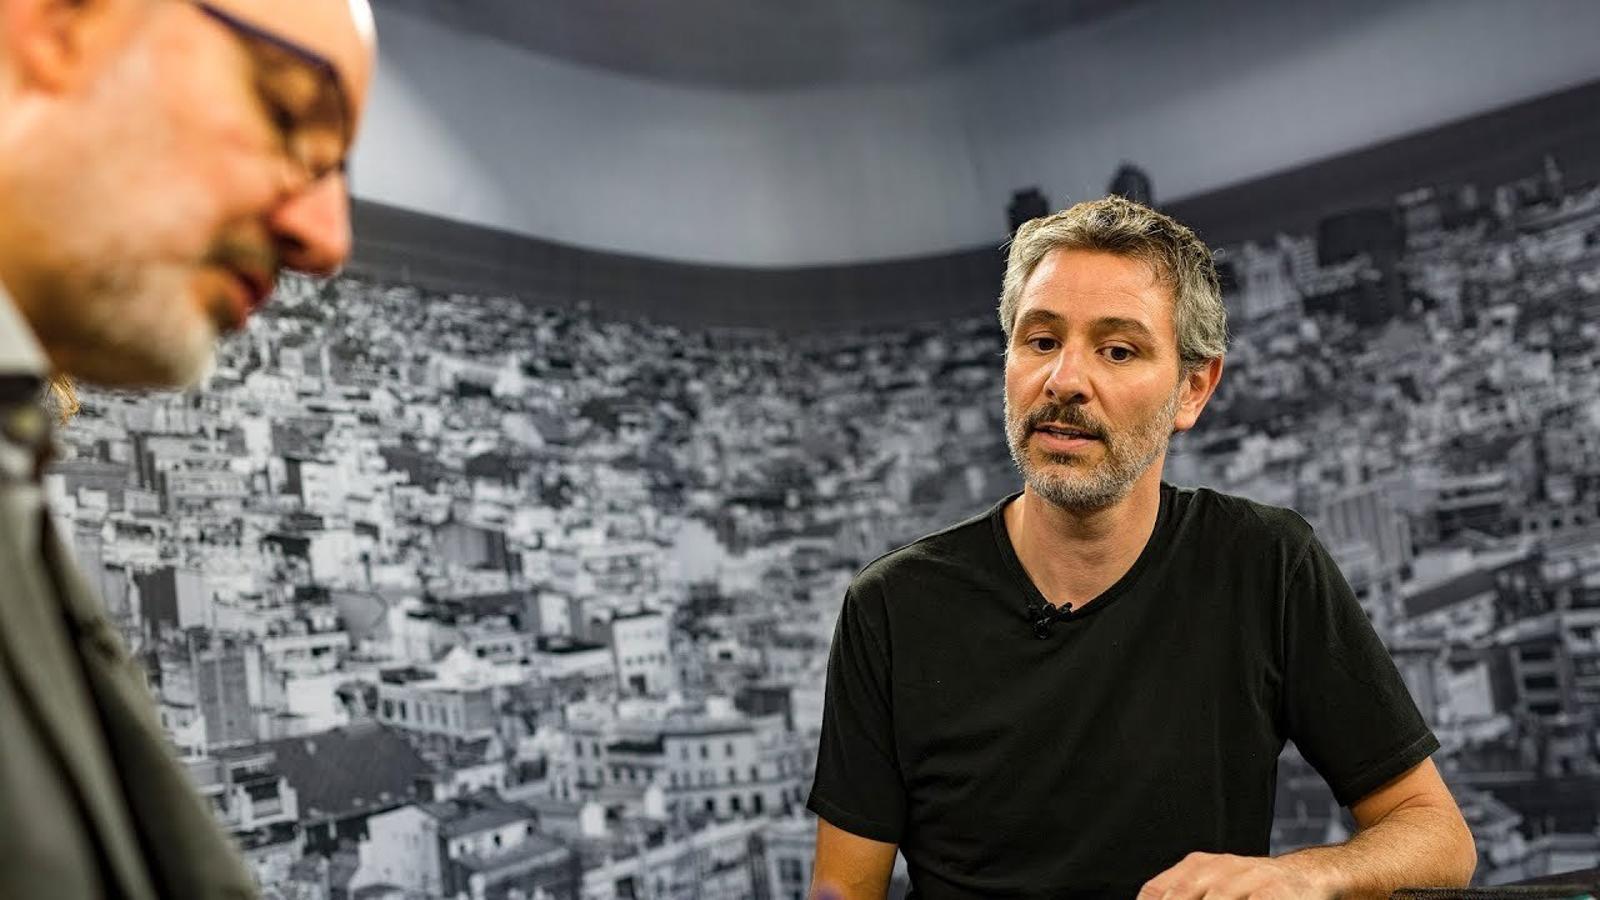 Entrevista d'Antoni Bassas a Carles Roig